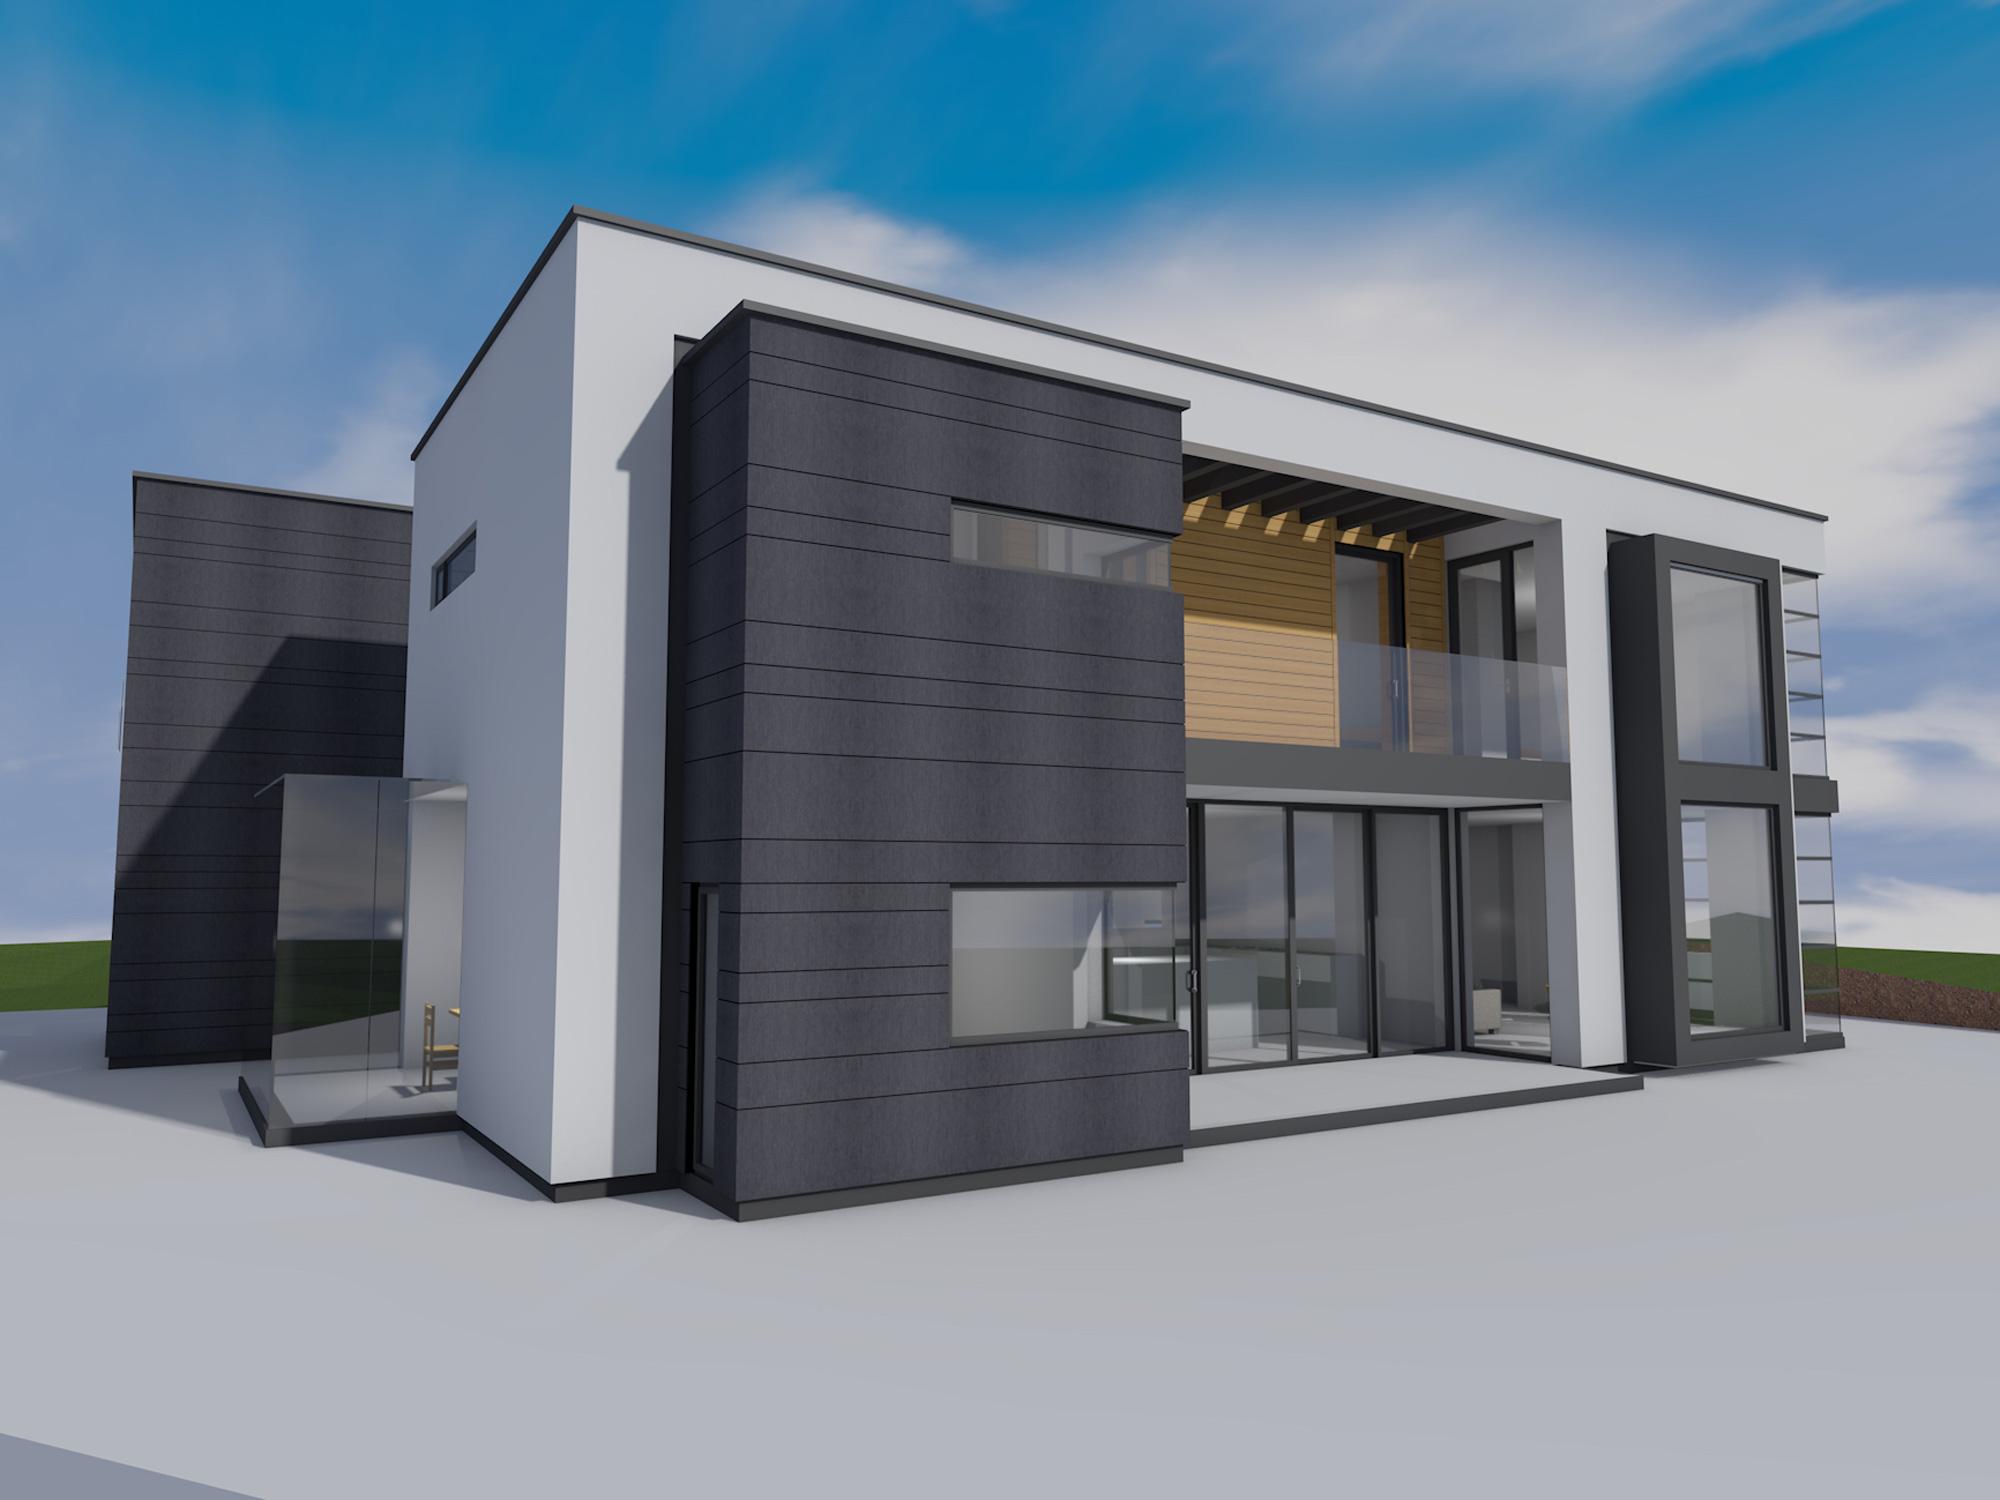 designing home SIPS